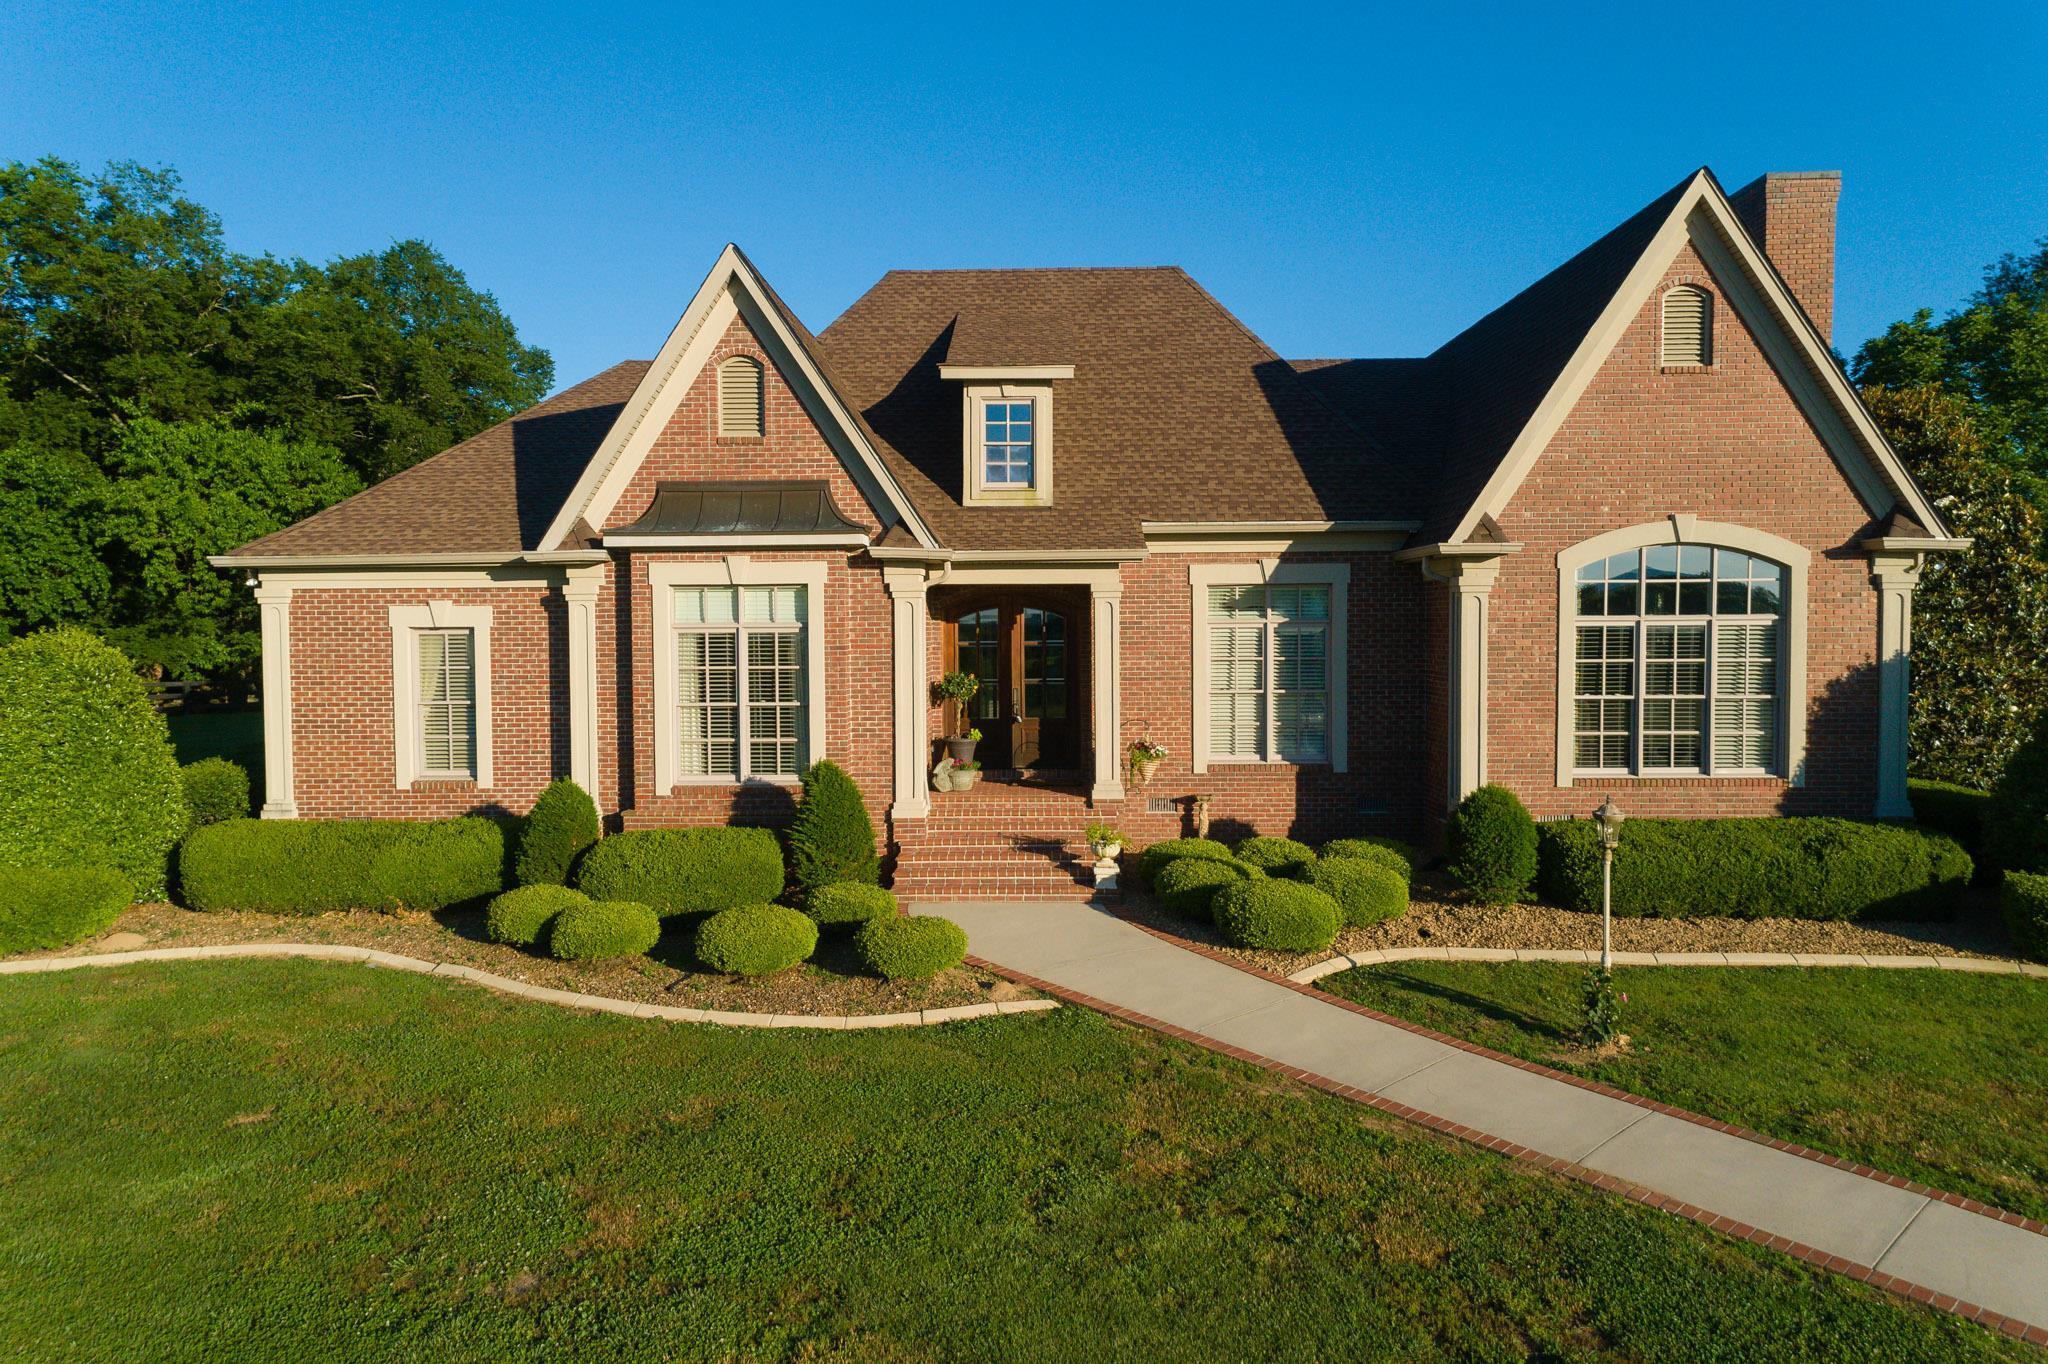 378 NORMANDY ROAD, Normandy, TN 37360 - Normandy, TN real estate listing